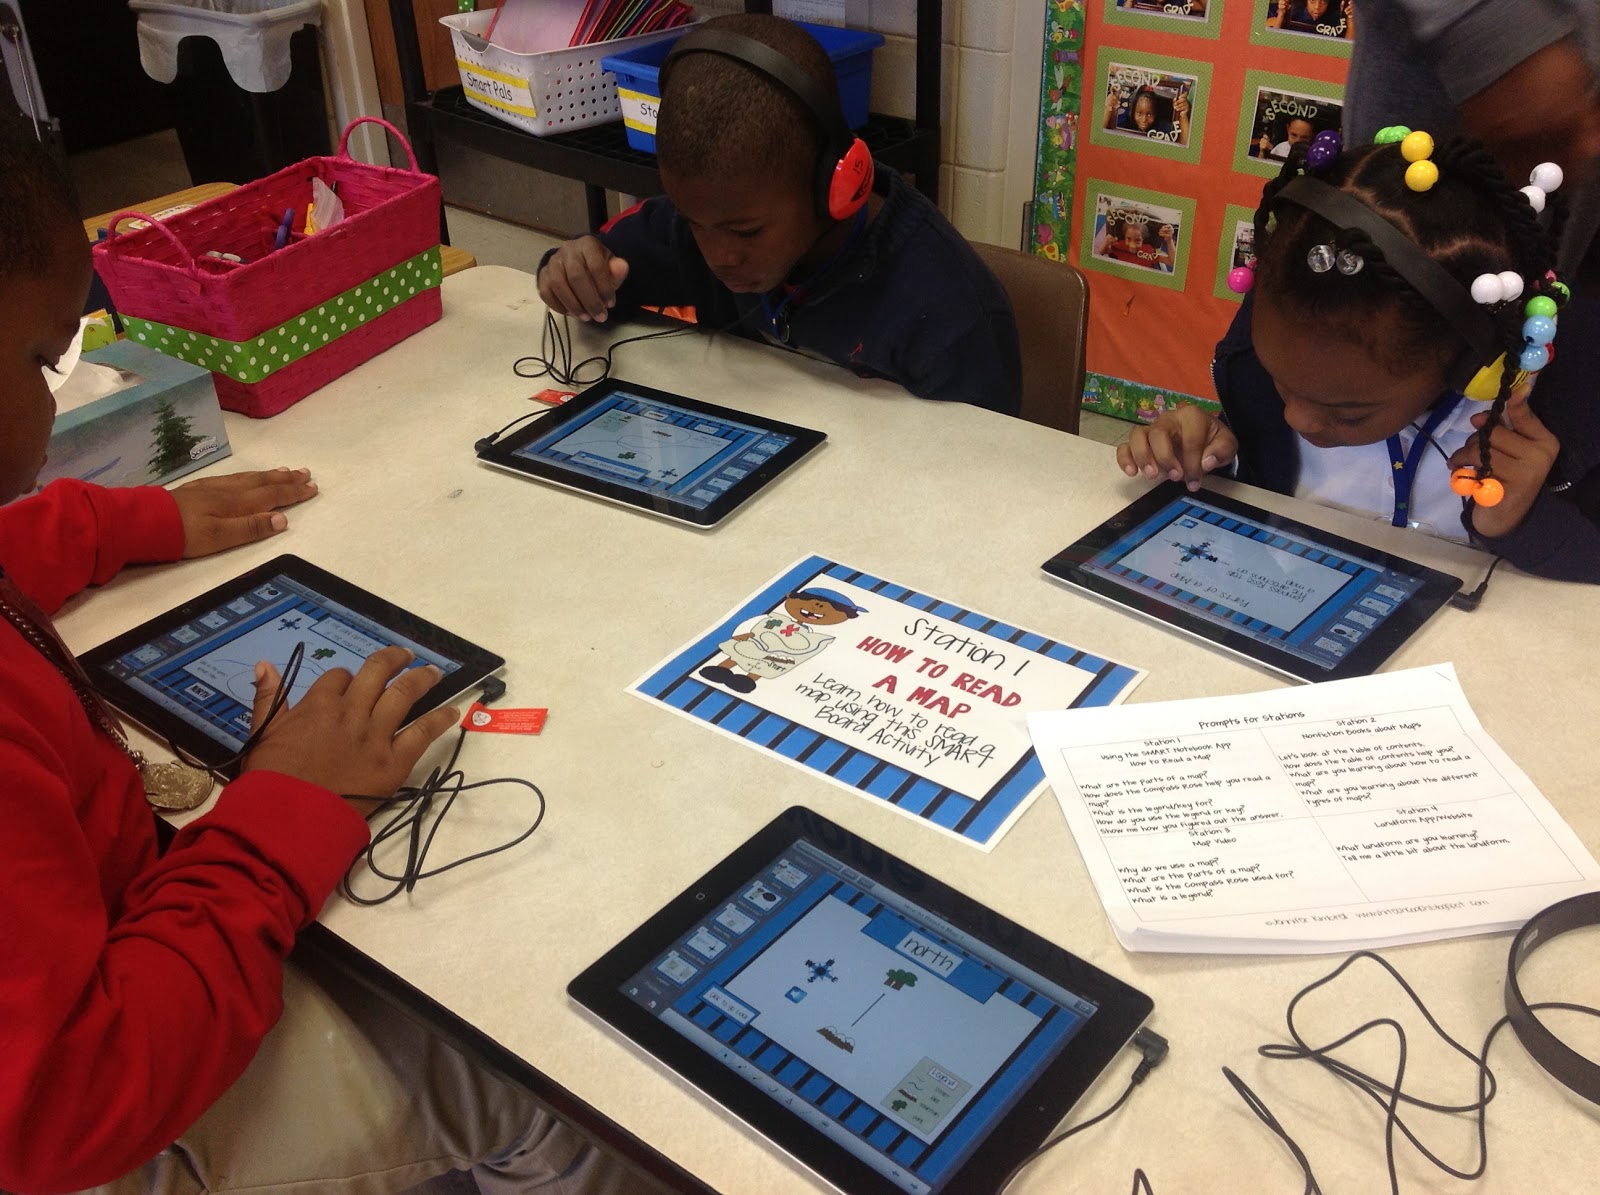 Digital or Old School Reading? - Image 1